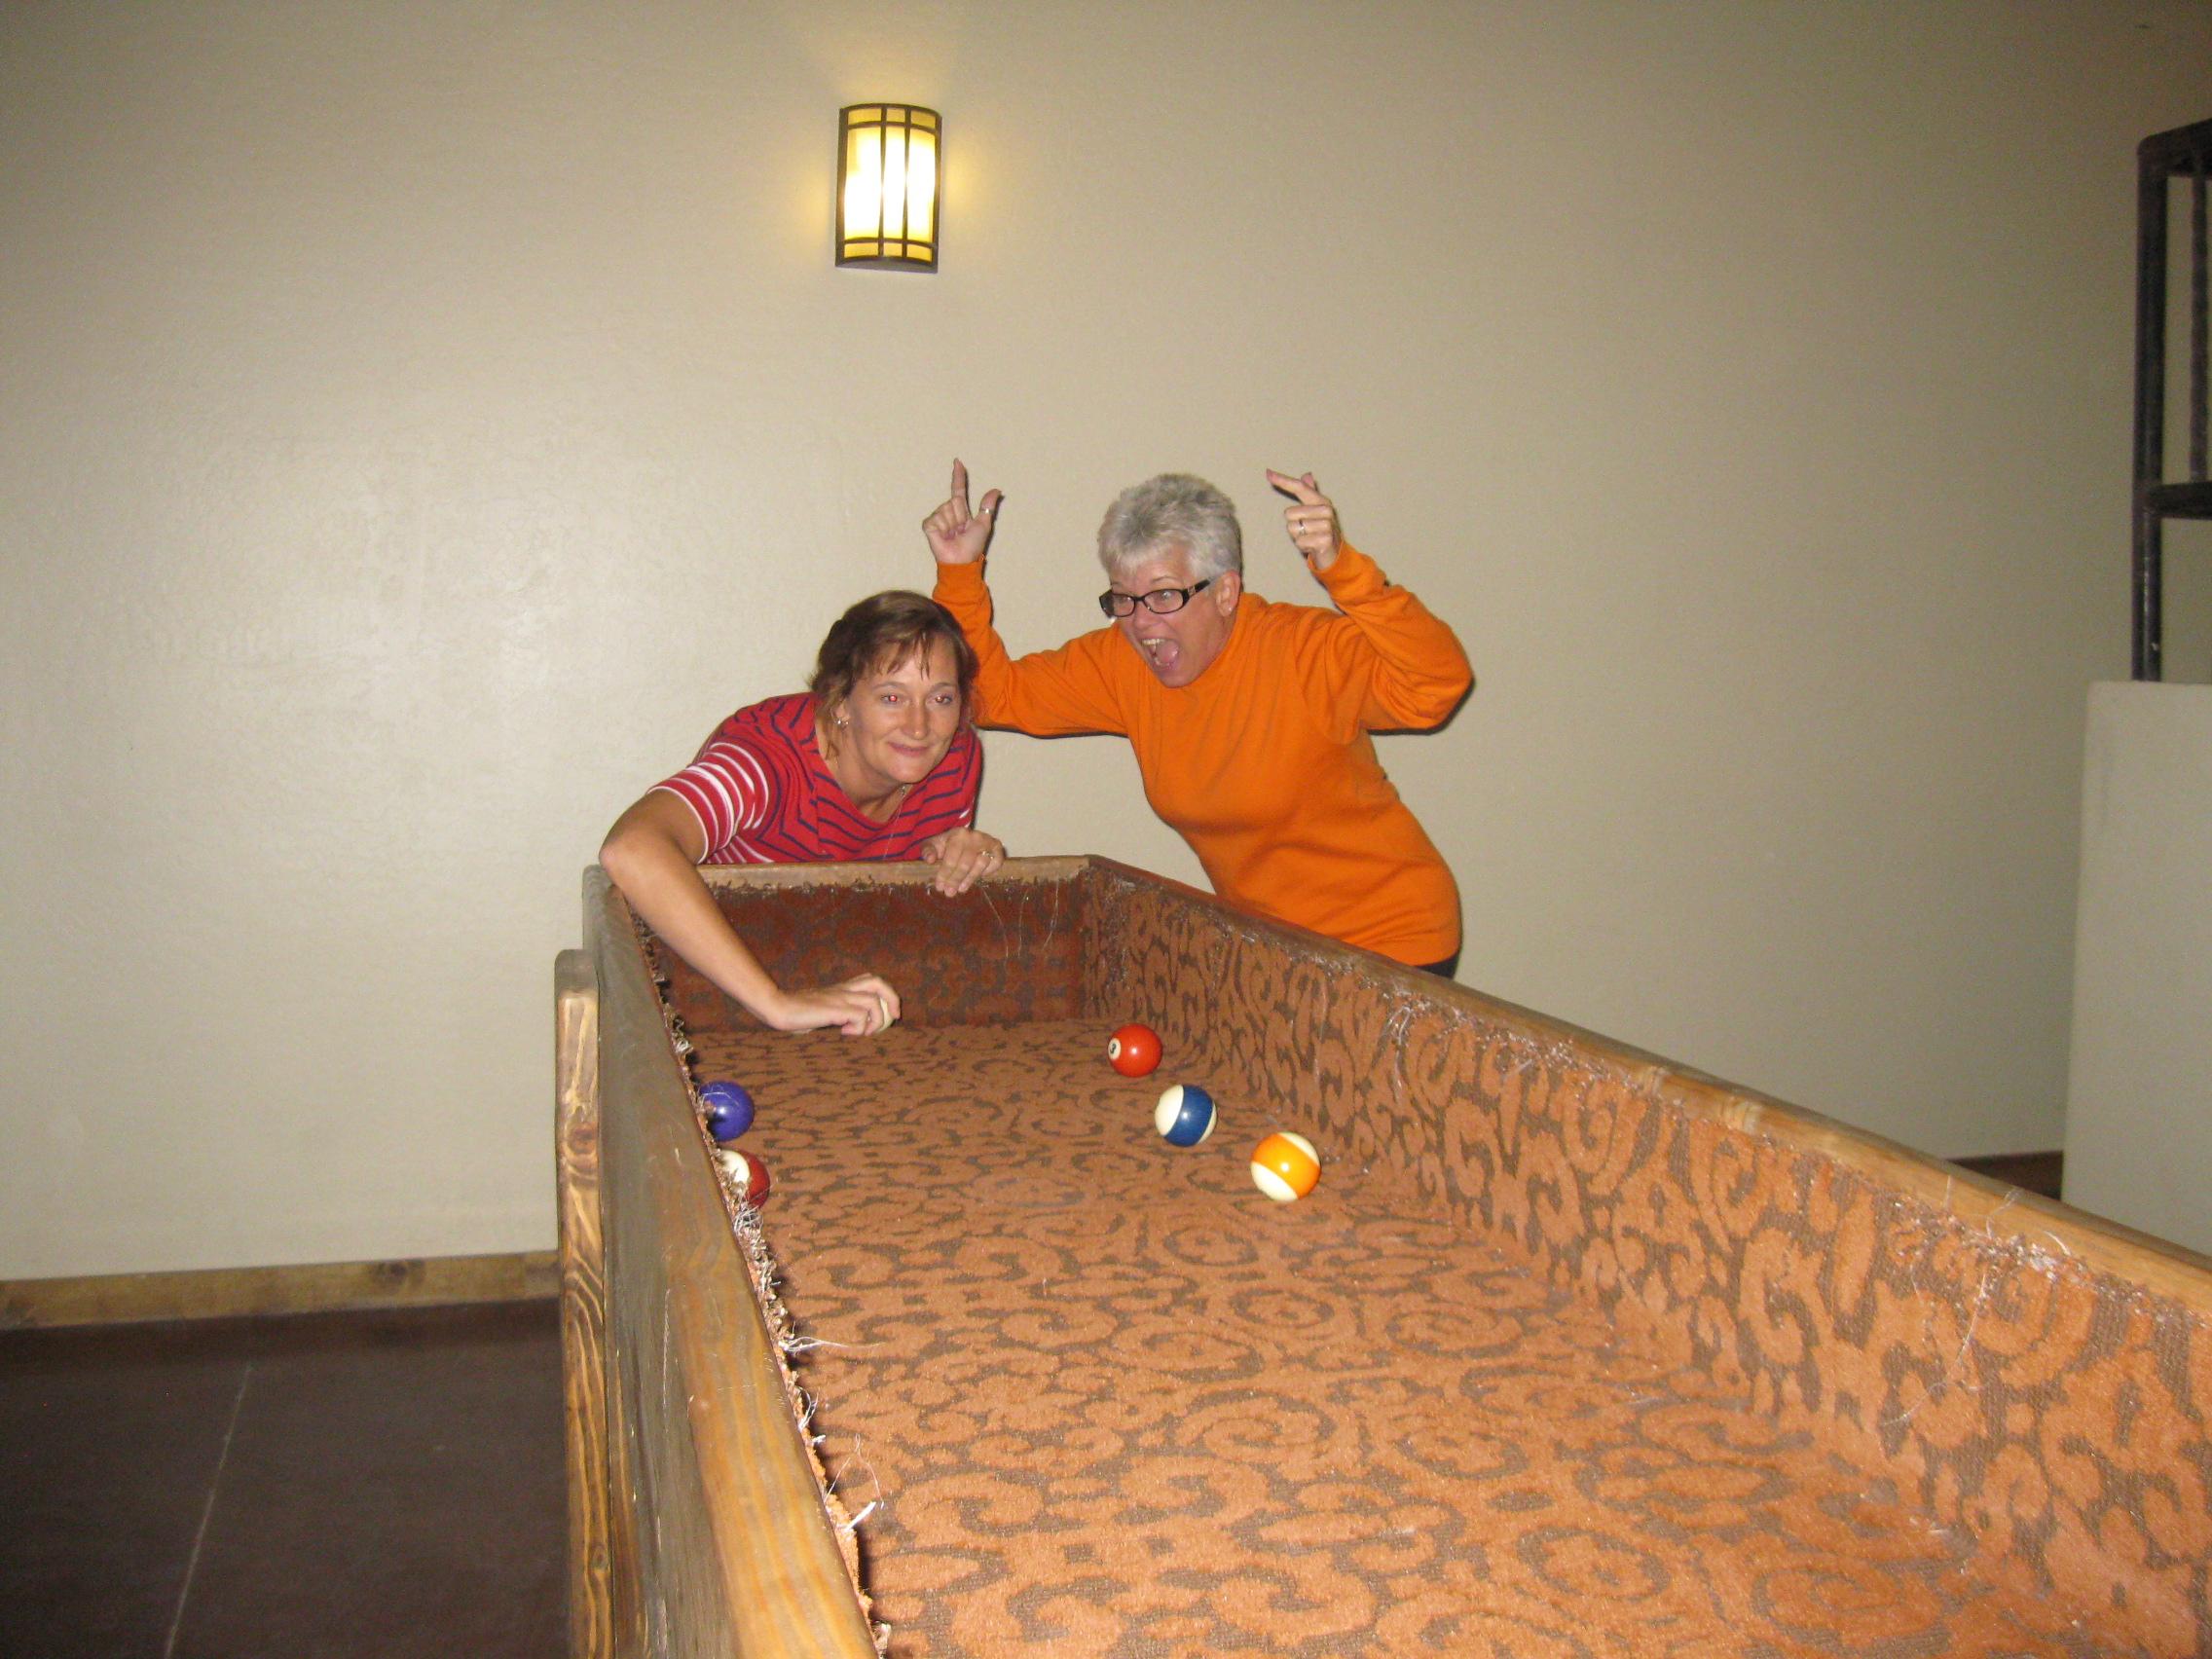 carpet ball power - Carpet Ball Table